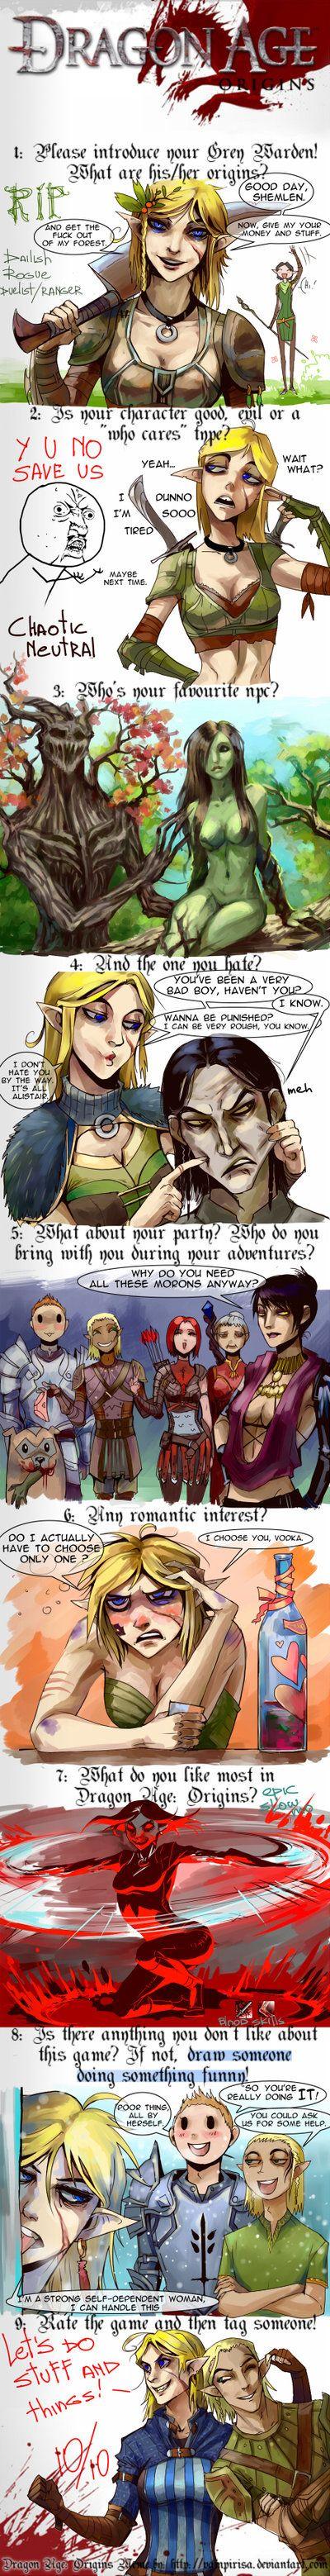 Dragon Age Origins Meme by NanoeTetsu.deviantart.com on @deviantART